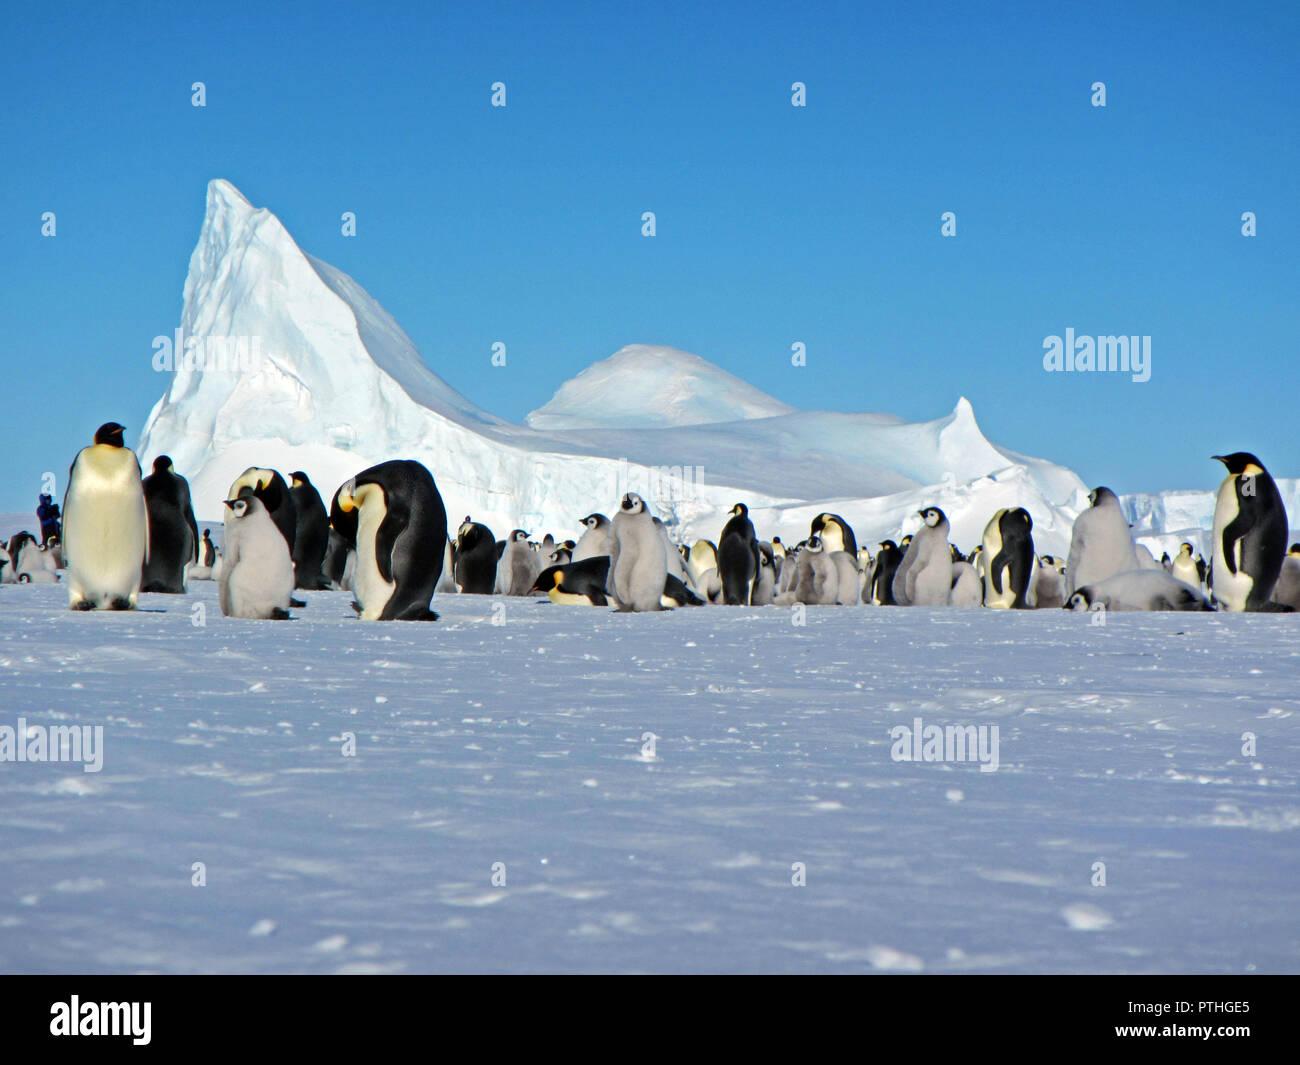 Colony, flock - Emperor Penguins in Antarctica. Overall plan - Stock Image